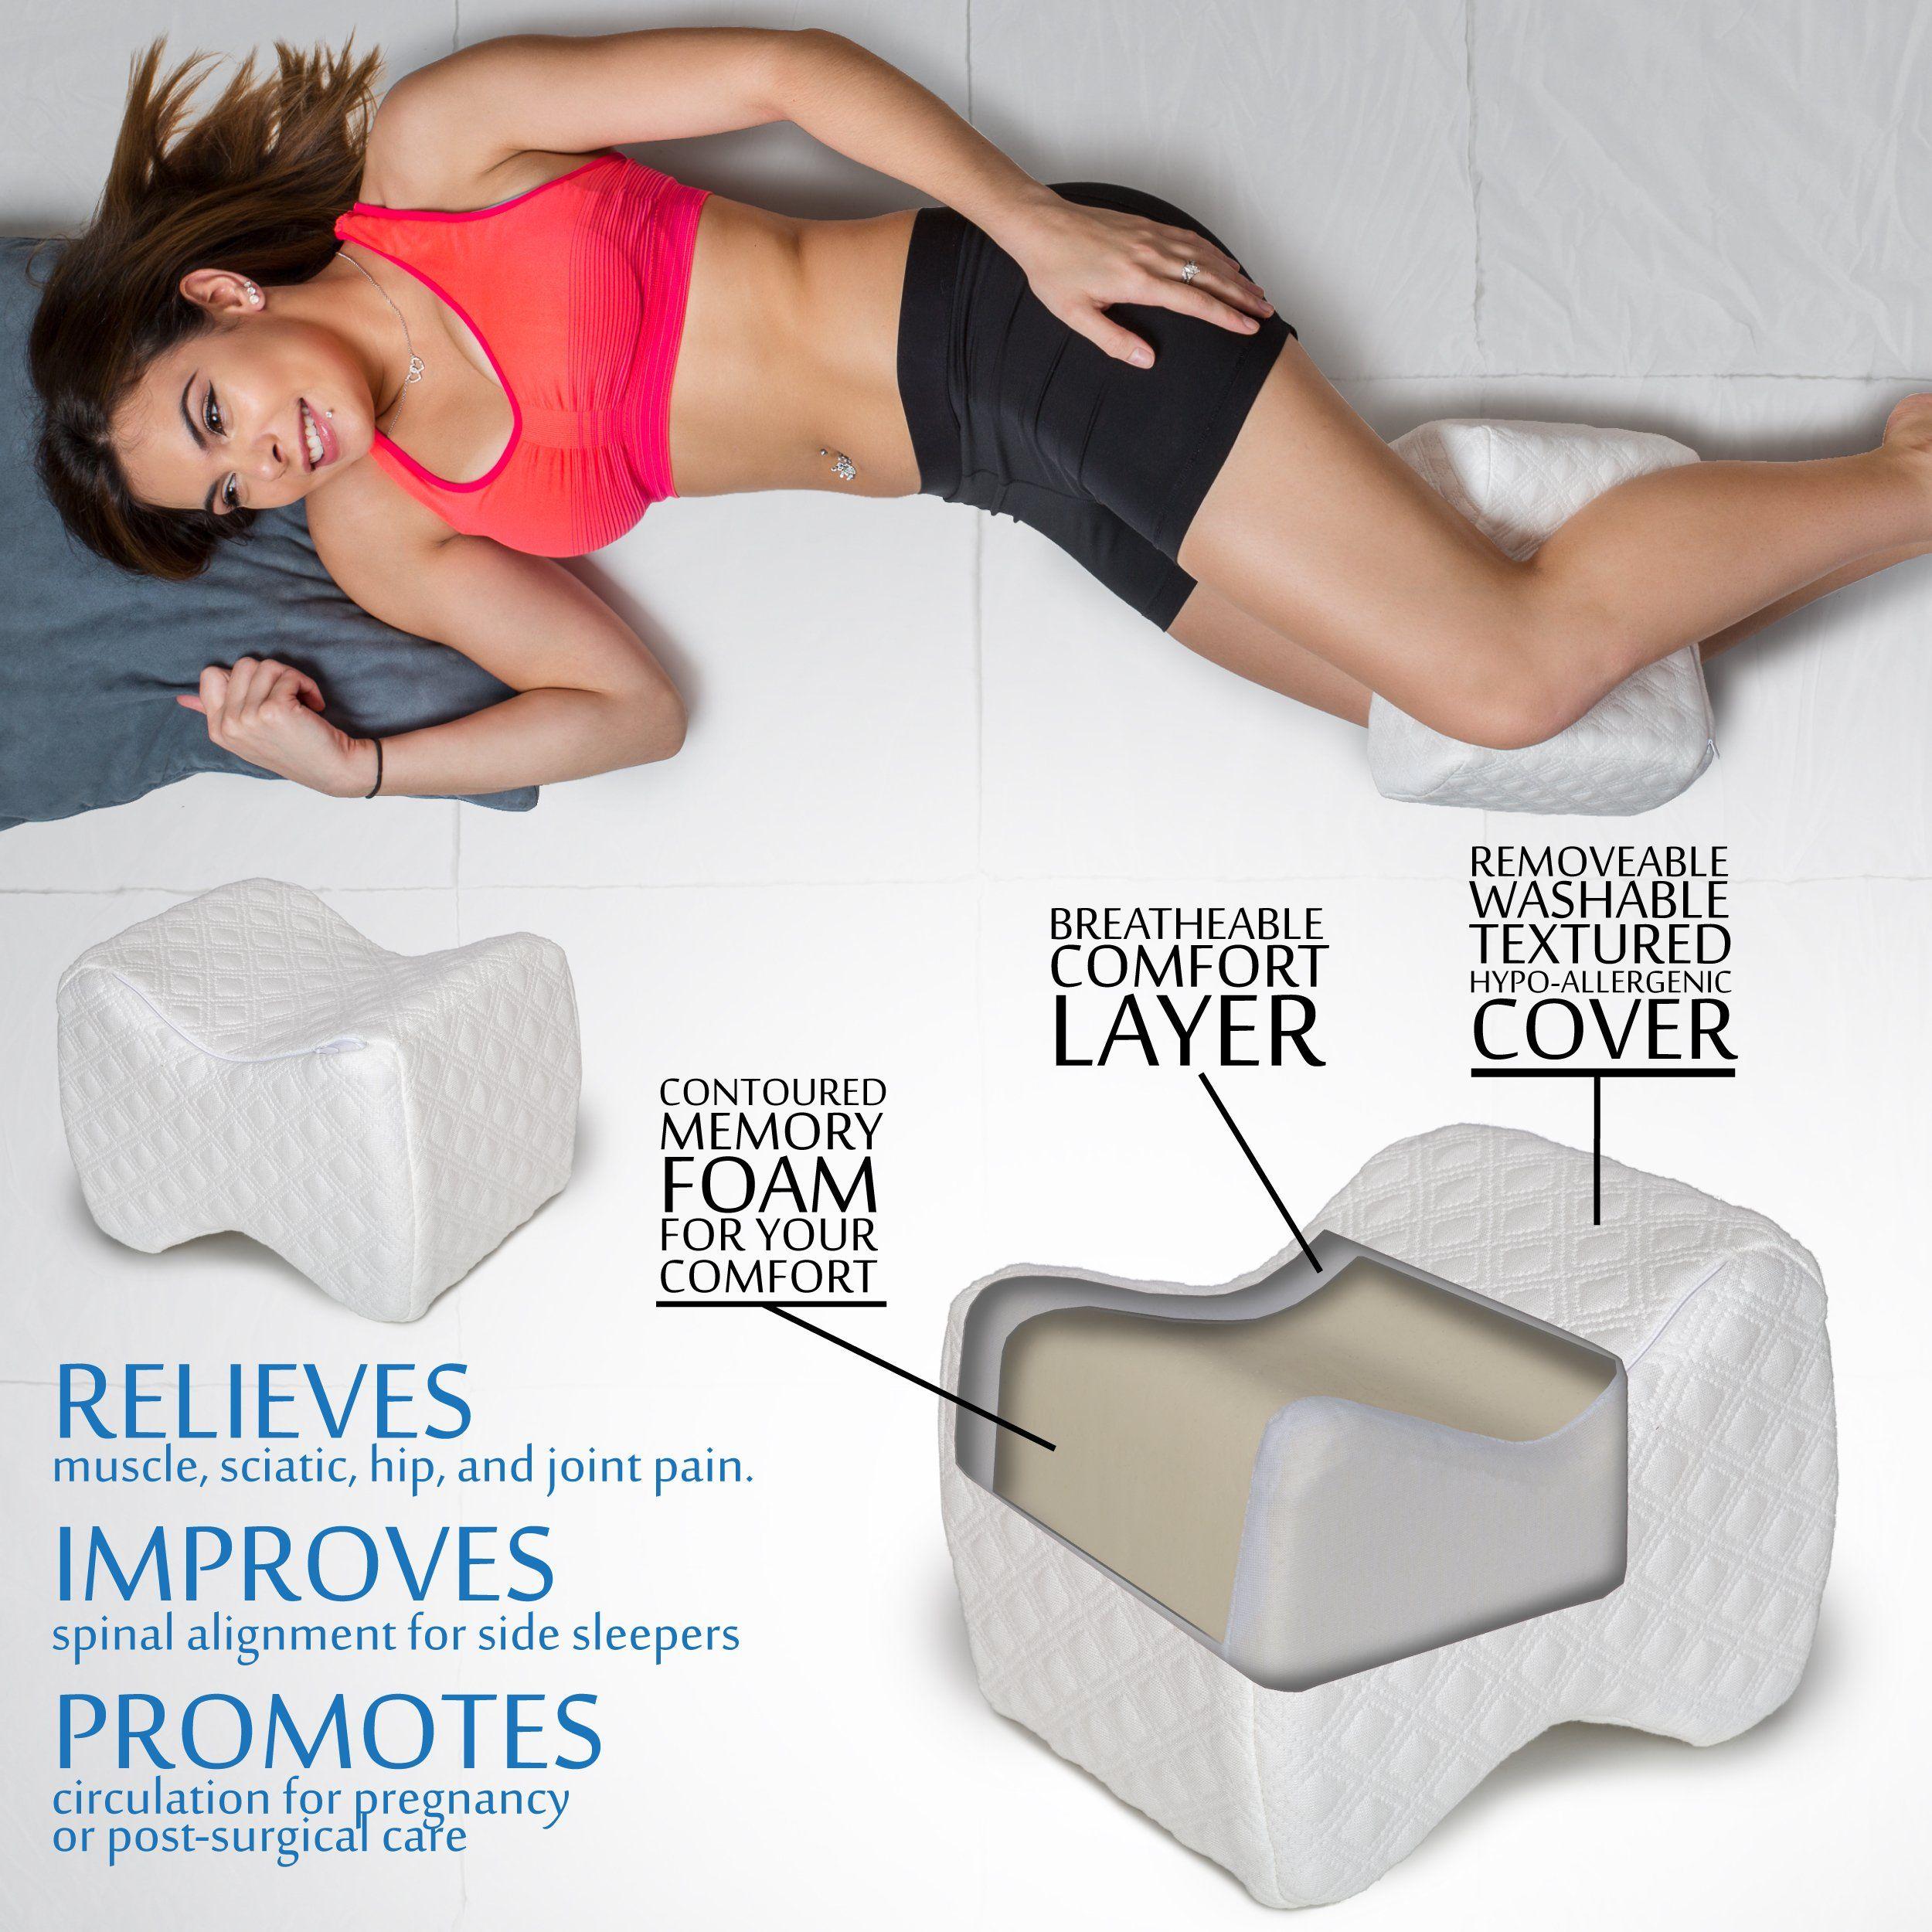 aeris knee pillow for side sleepersmaximum sciaticajointhiprestless